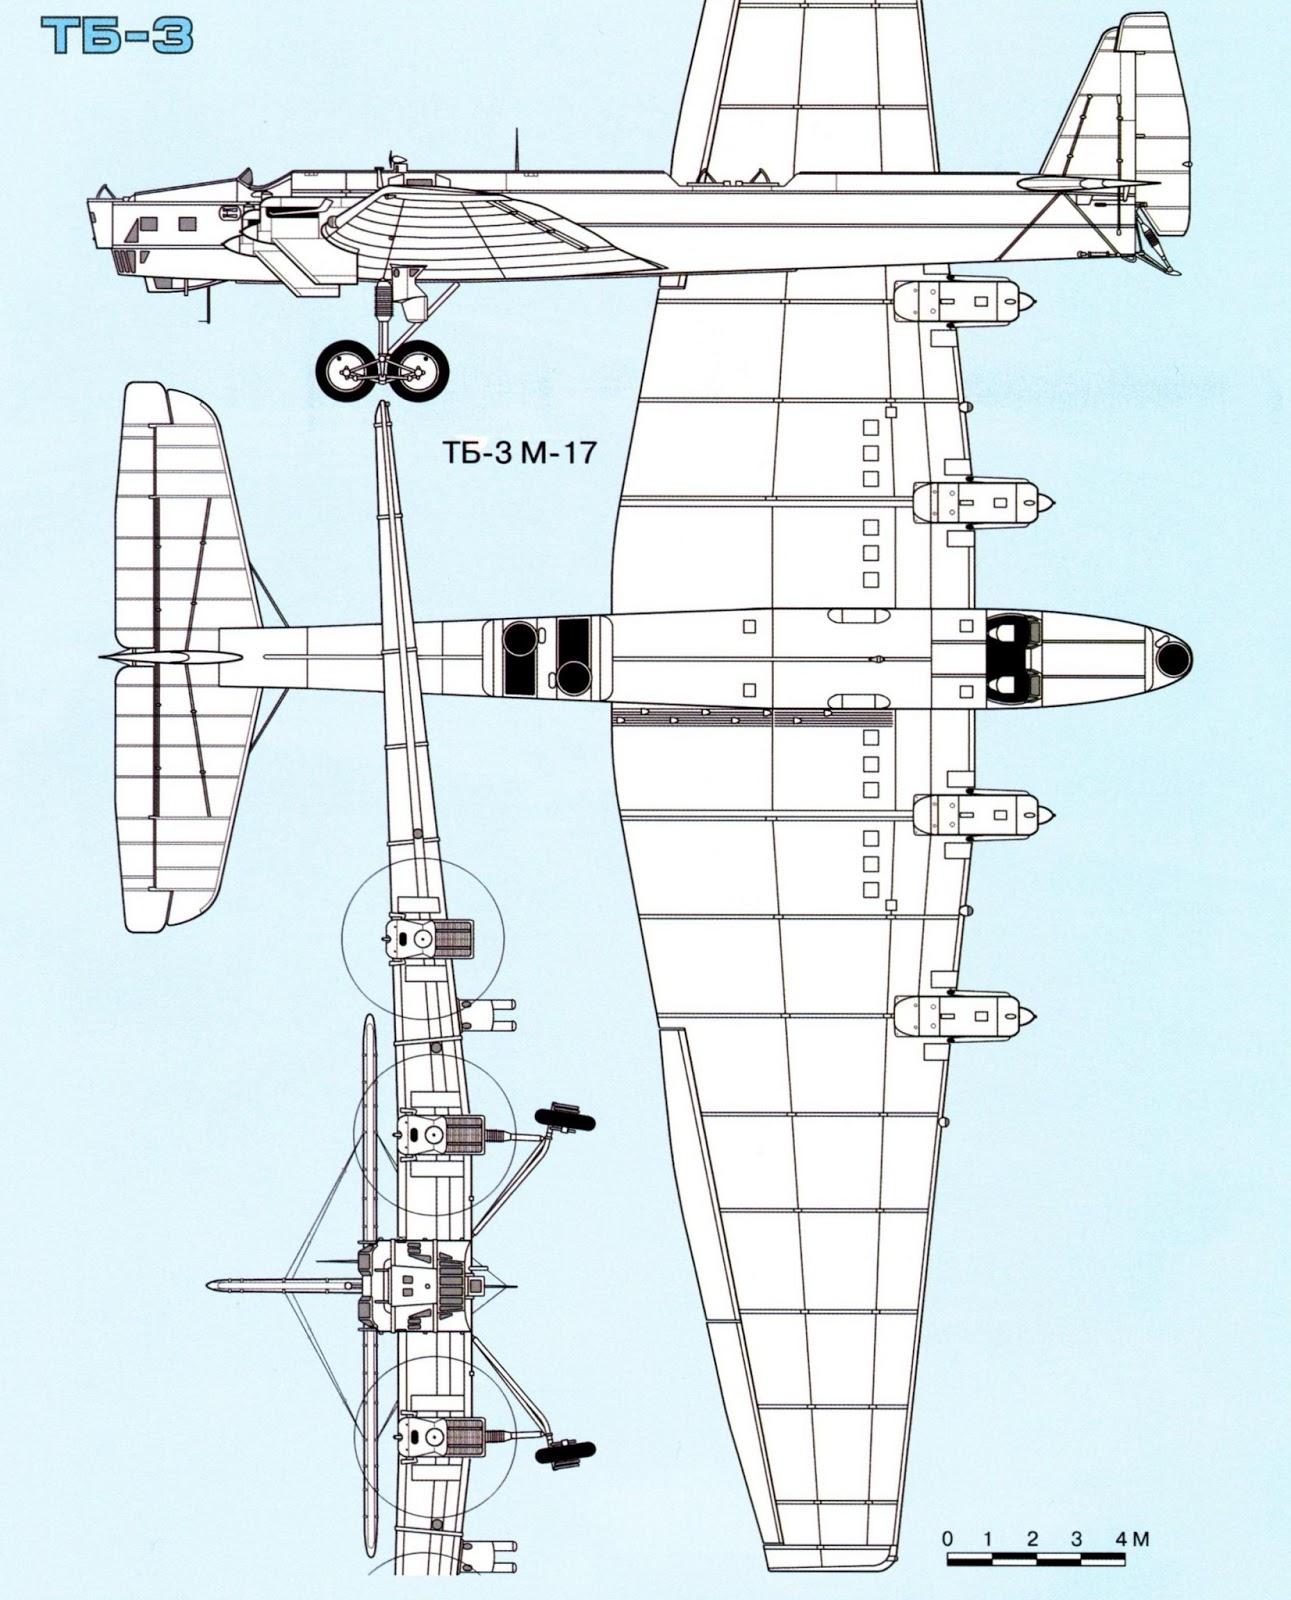 характеристики ТБ-3